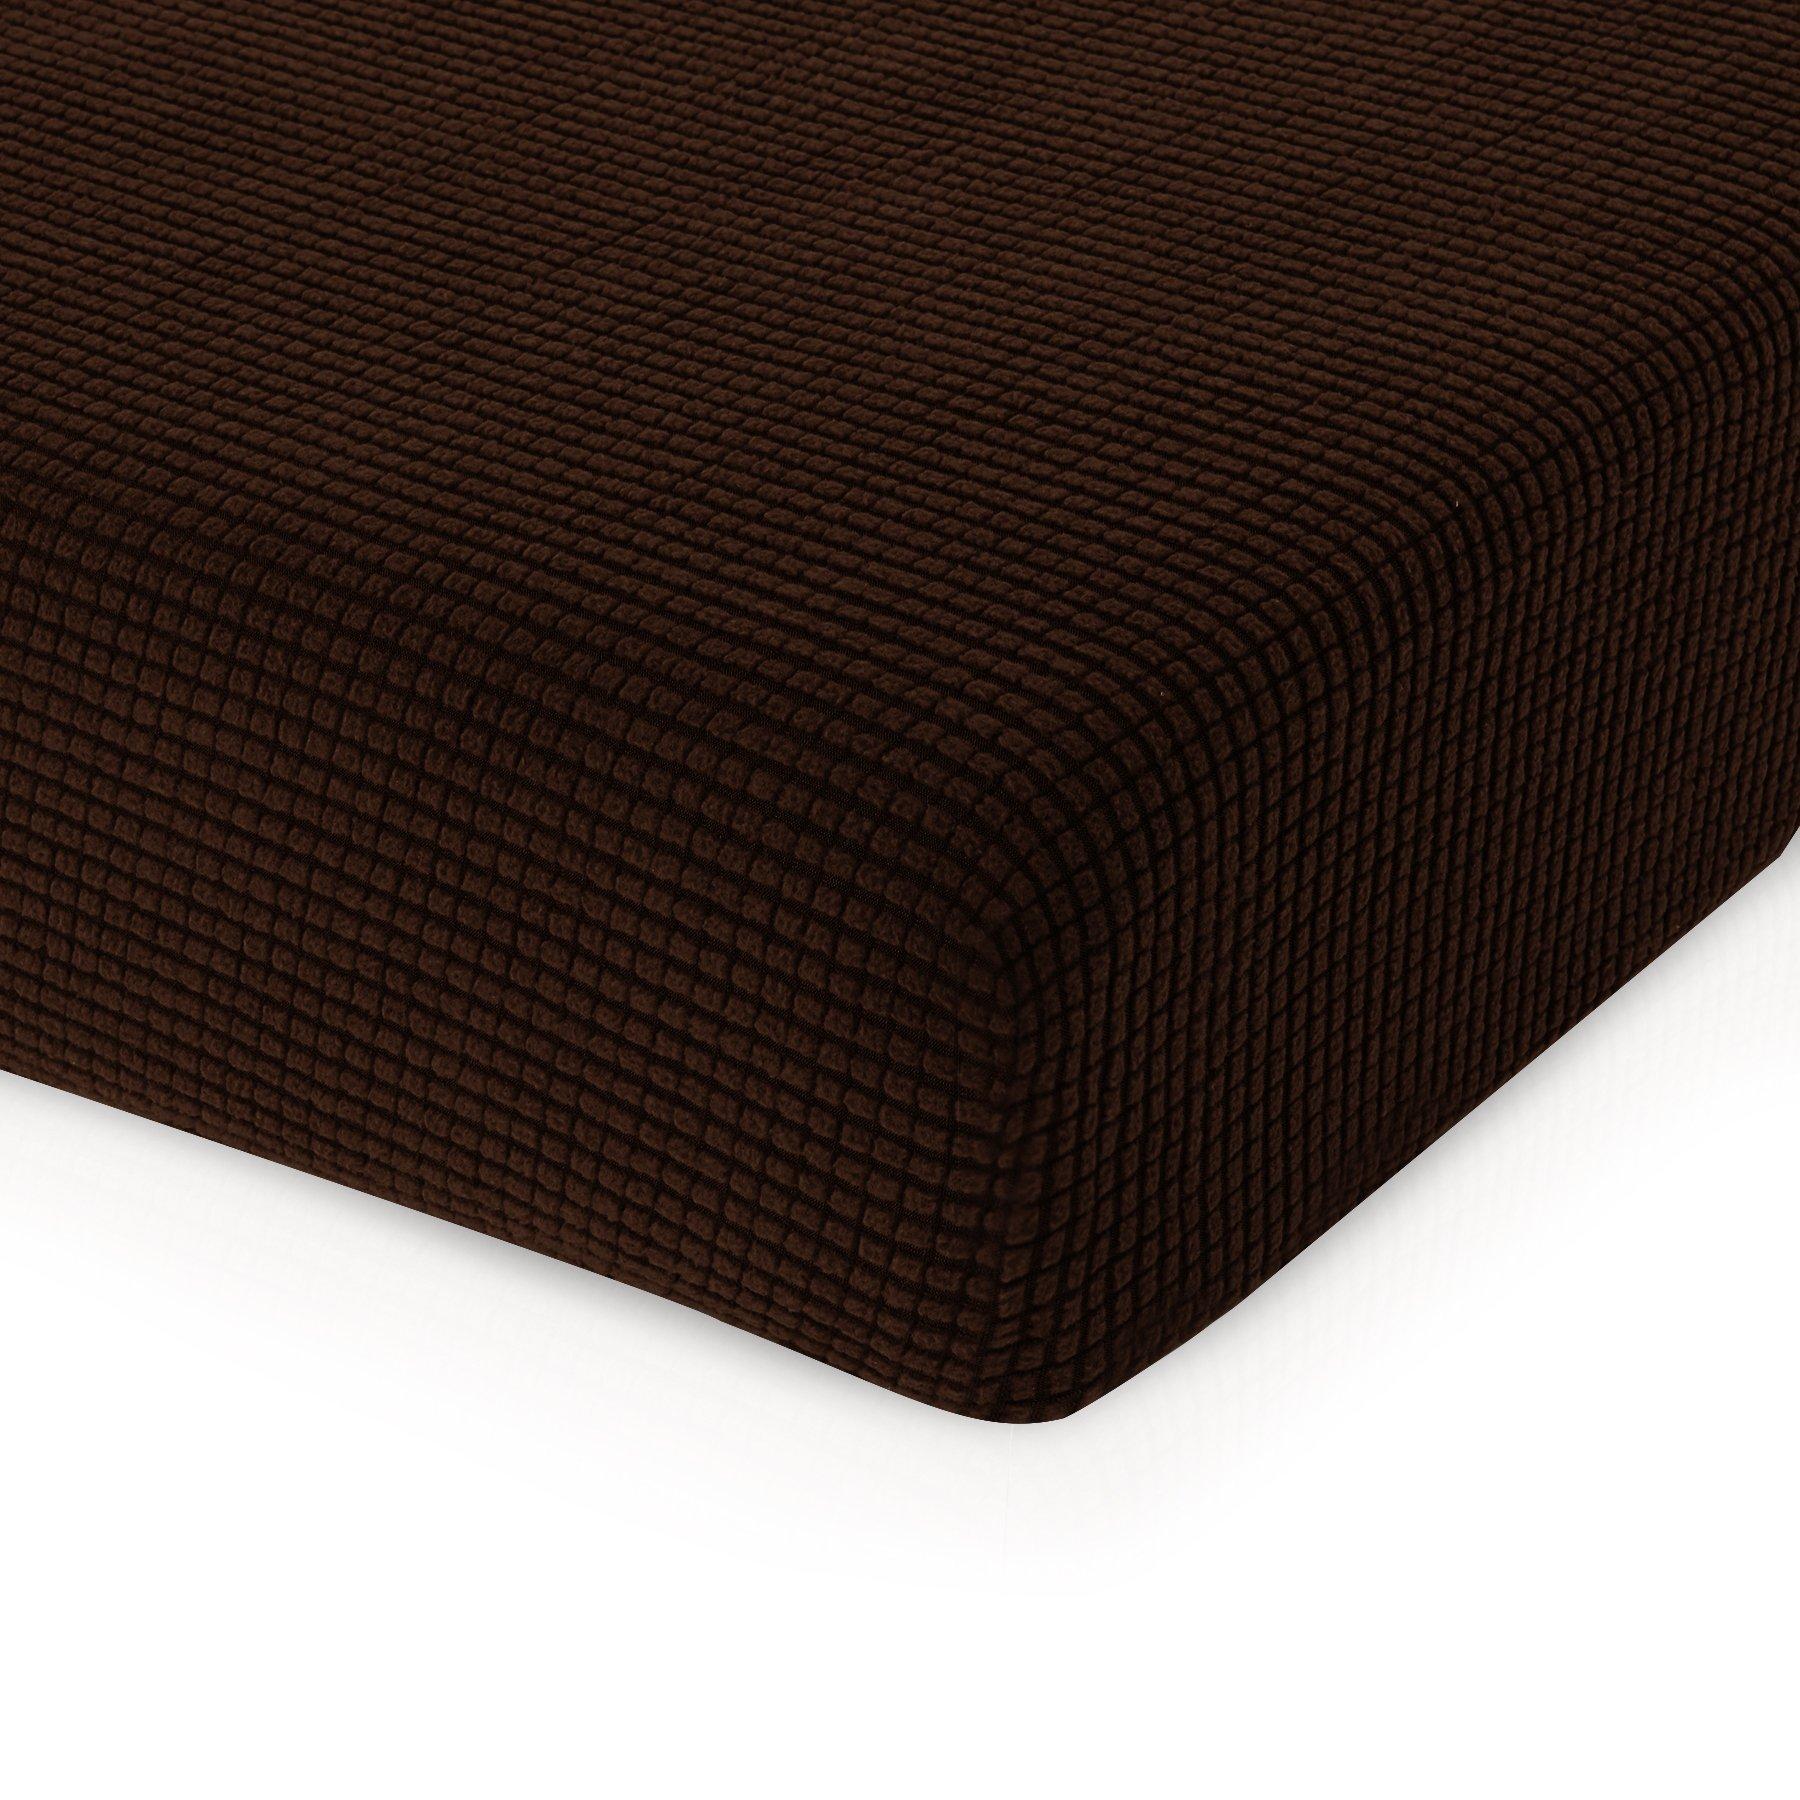 CHUN YI Jacquard Polyester Spandex Slipcover (Sofa Cushion, Chocolate)